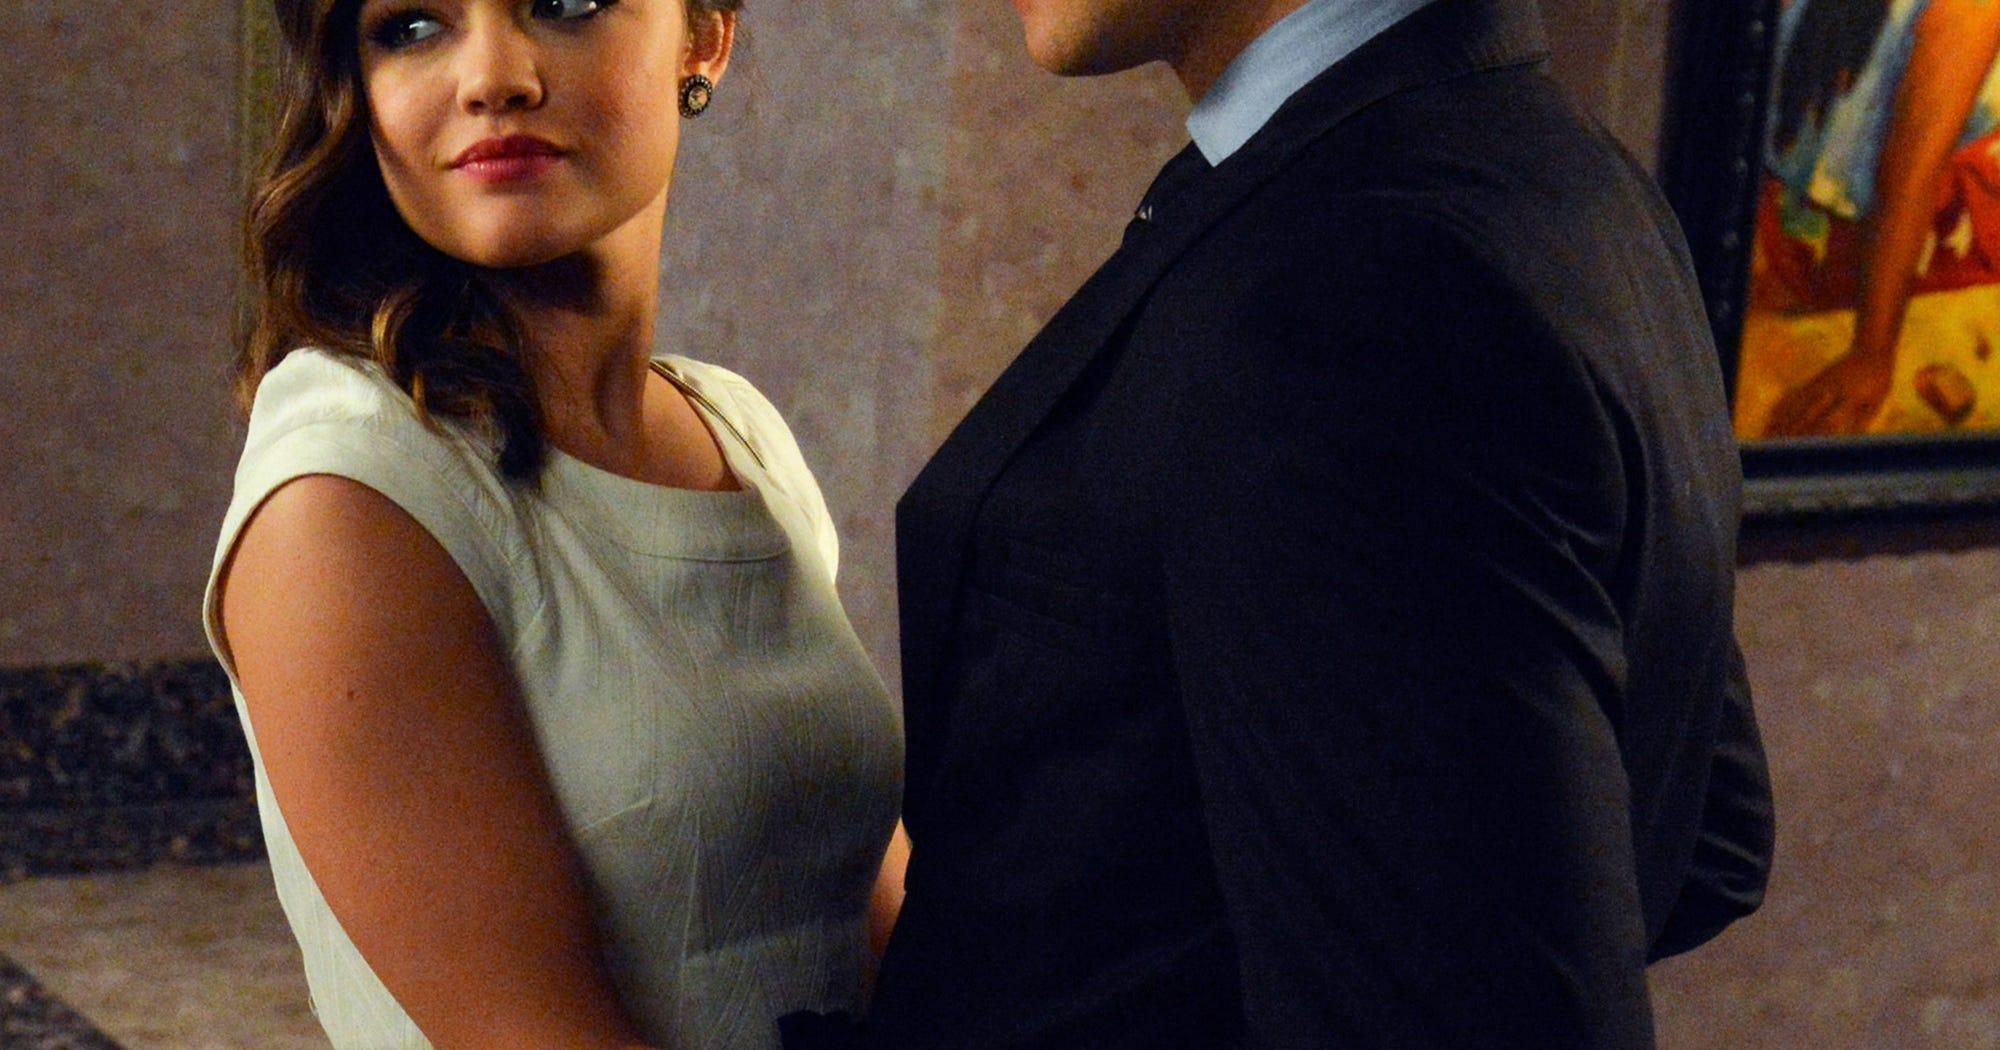 Lucy Hale dating Ezra avio liitto ei dating OST albumi